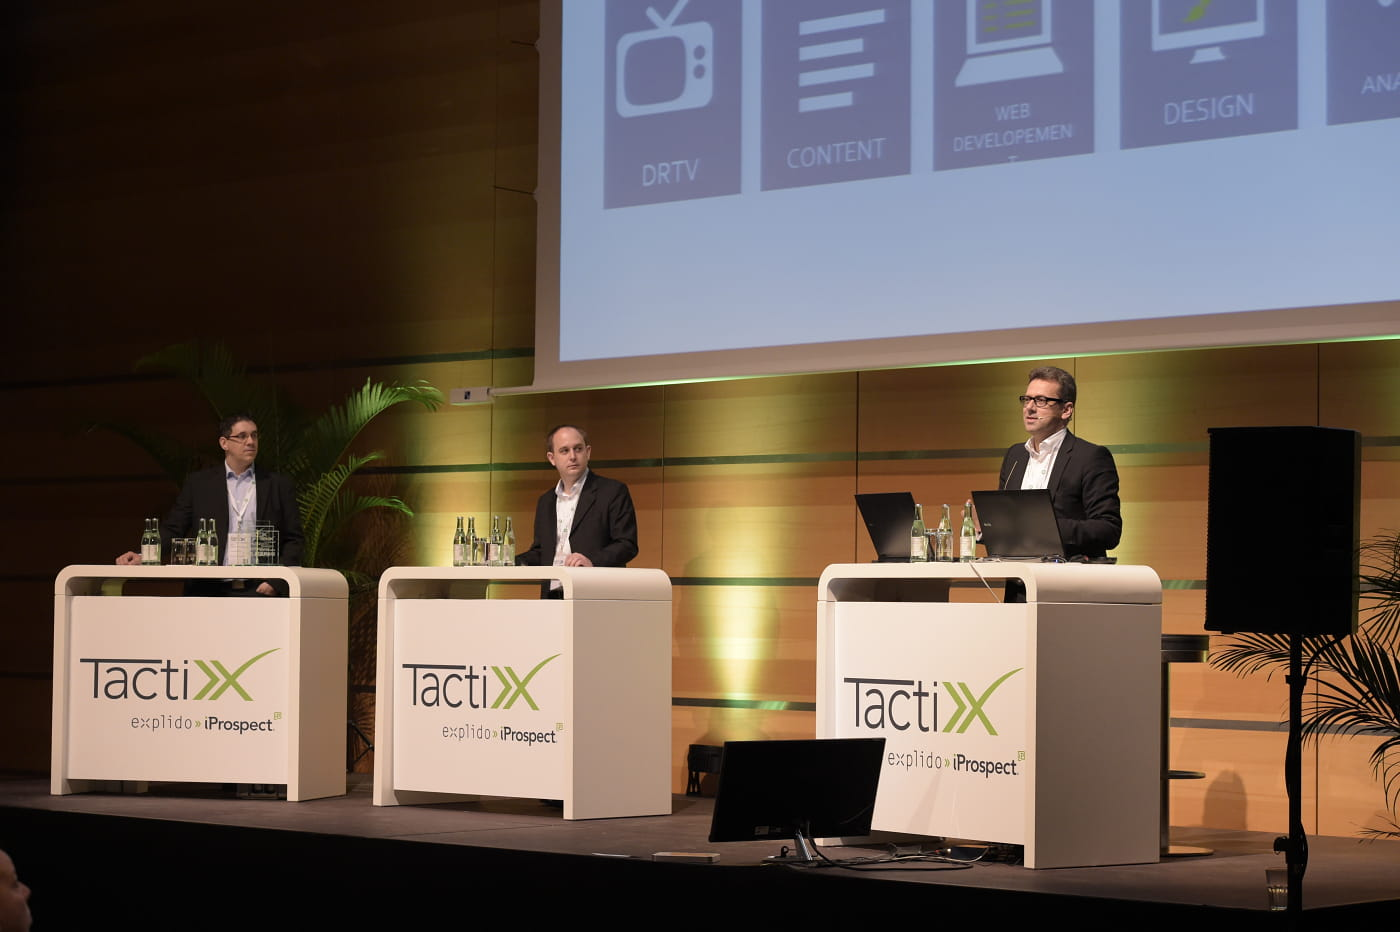 Das war die TactixX 2015 - Recap